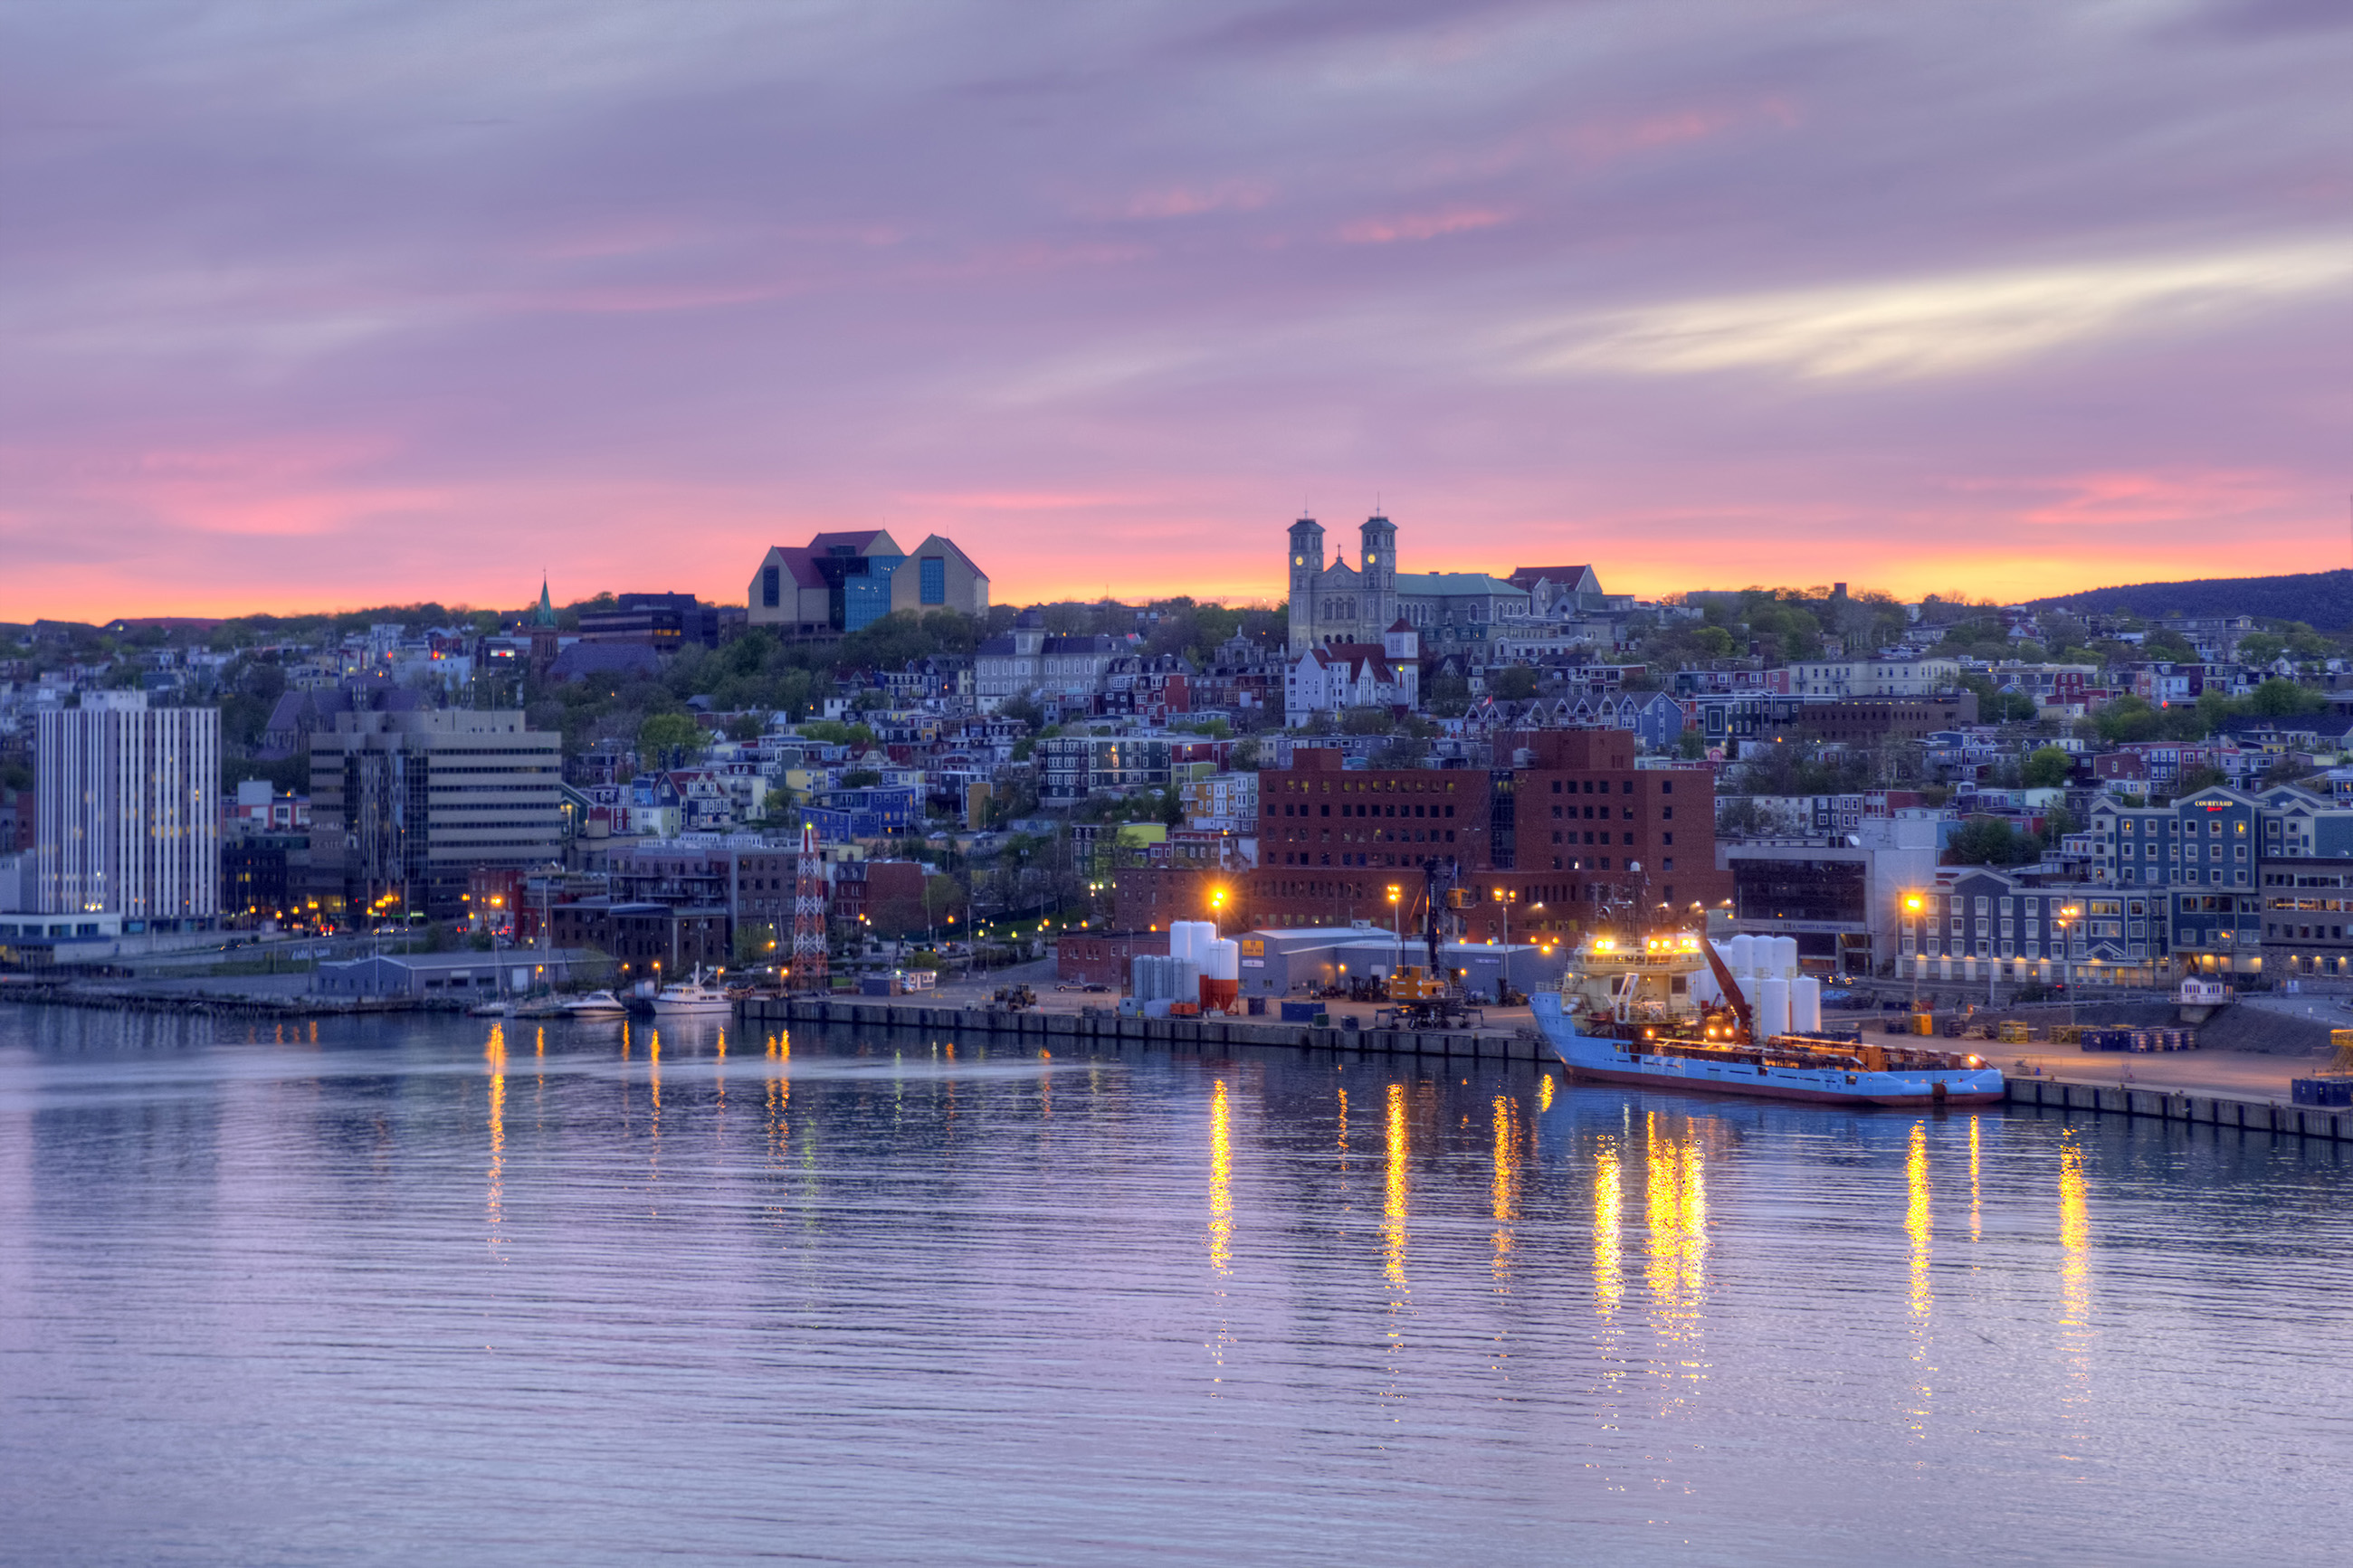 St. John's, Atlantic, Maritime, Water, Travel, HQ Photo